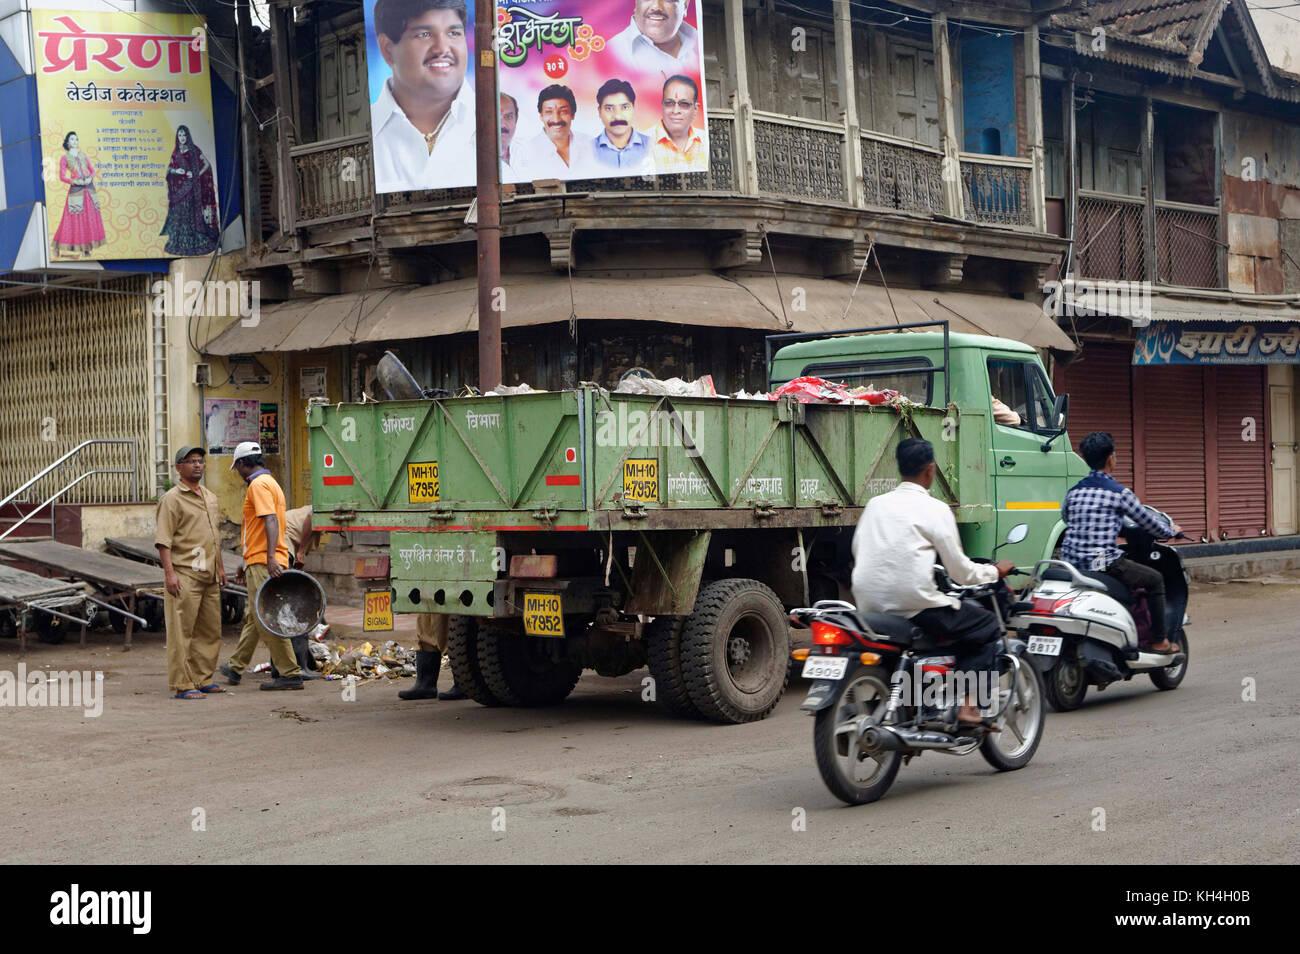 Mann Reinigung Müll, miraj, Maharashtra, Indien, Asien Stockbild